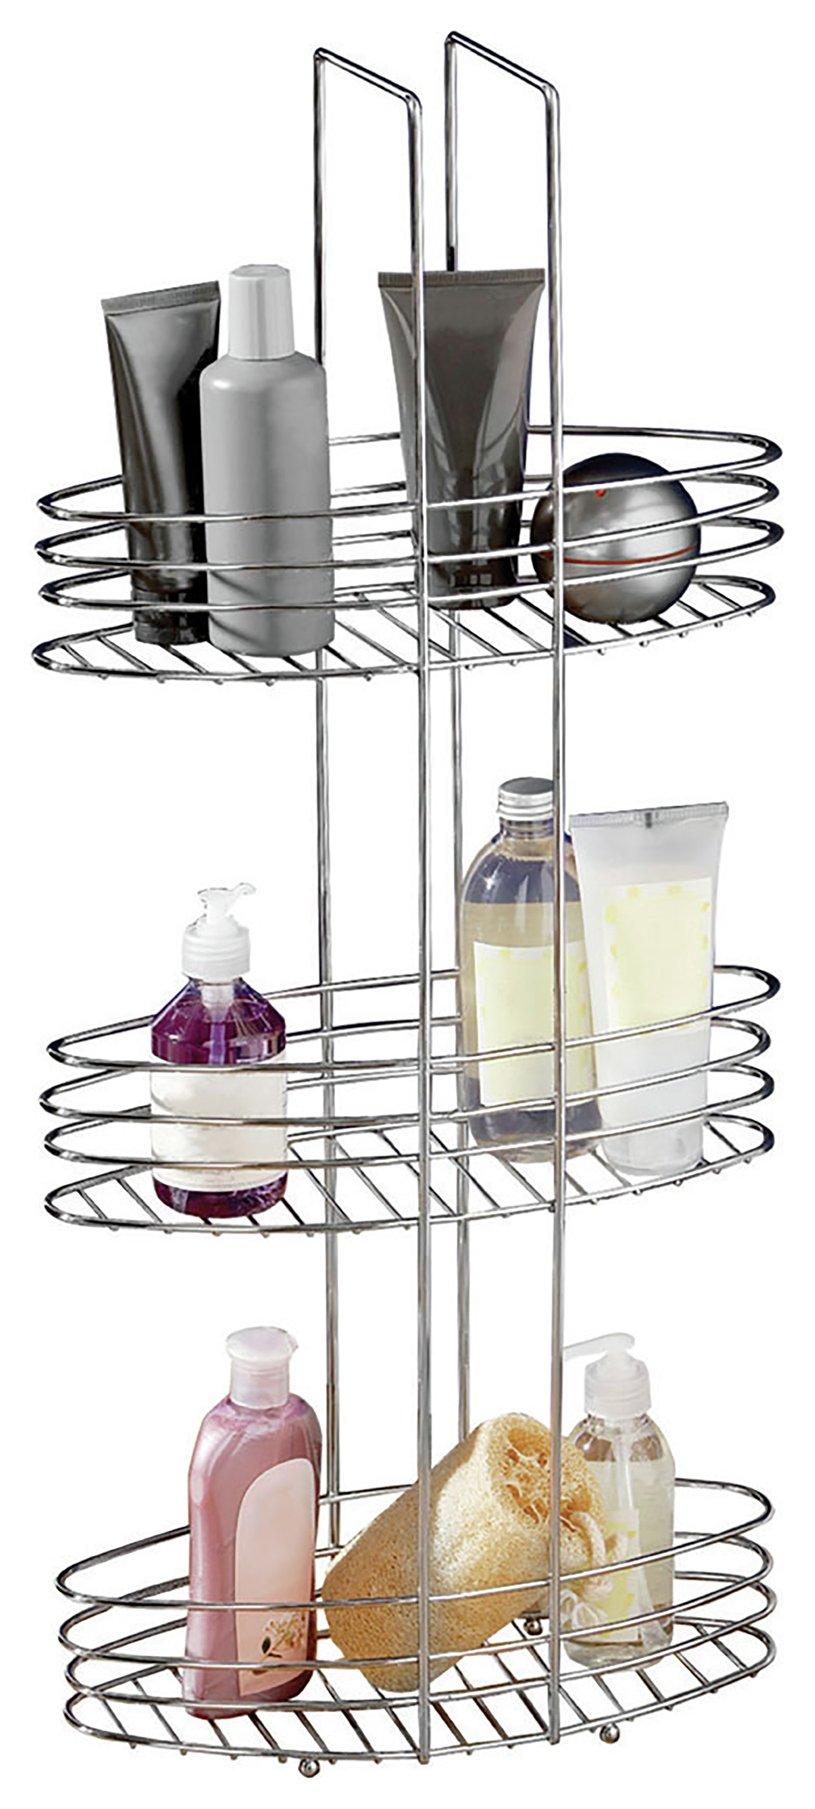 Premier Housewares 3 Tier Bathroom Organiser - Chrome.